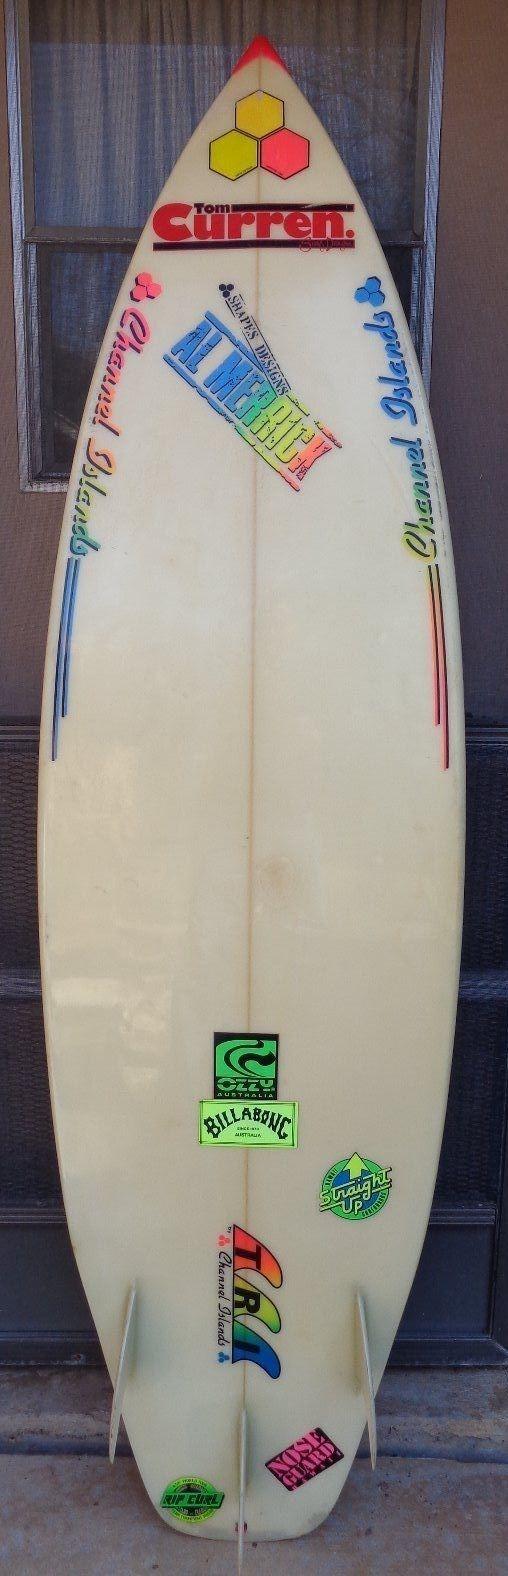 "Al Merrick Tom Curren Surf Designs 6'2"" 80s Channel Islands Surfboard | eBay"